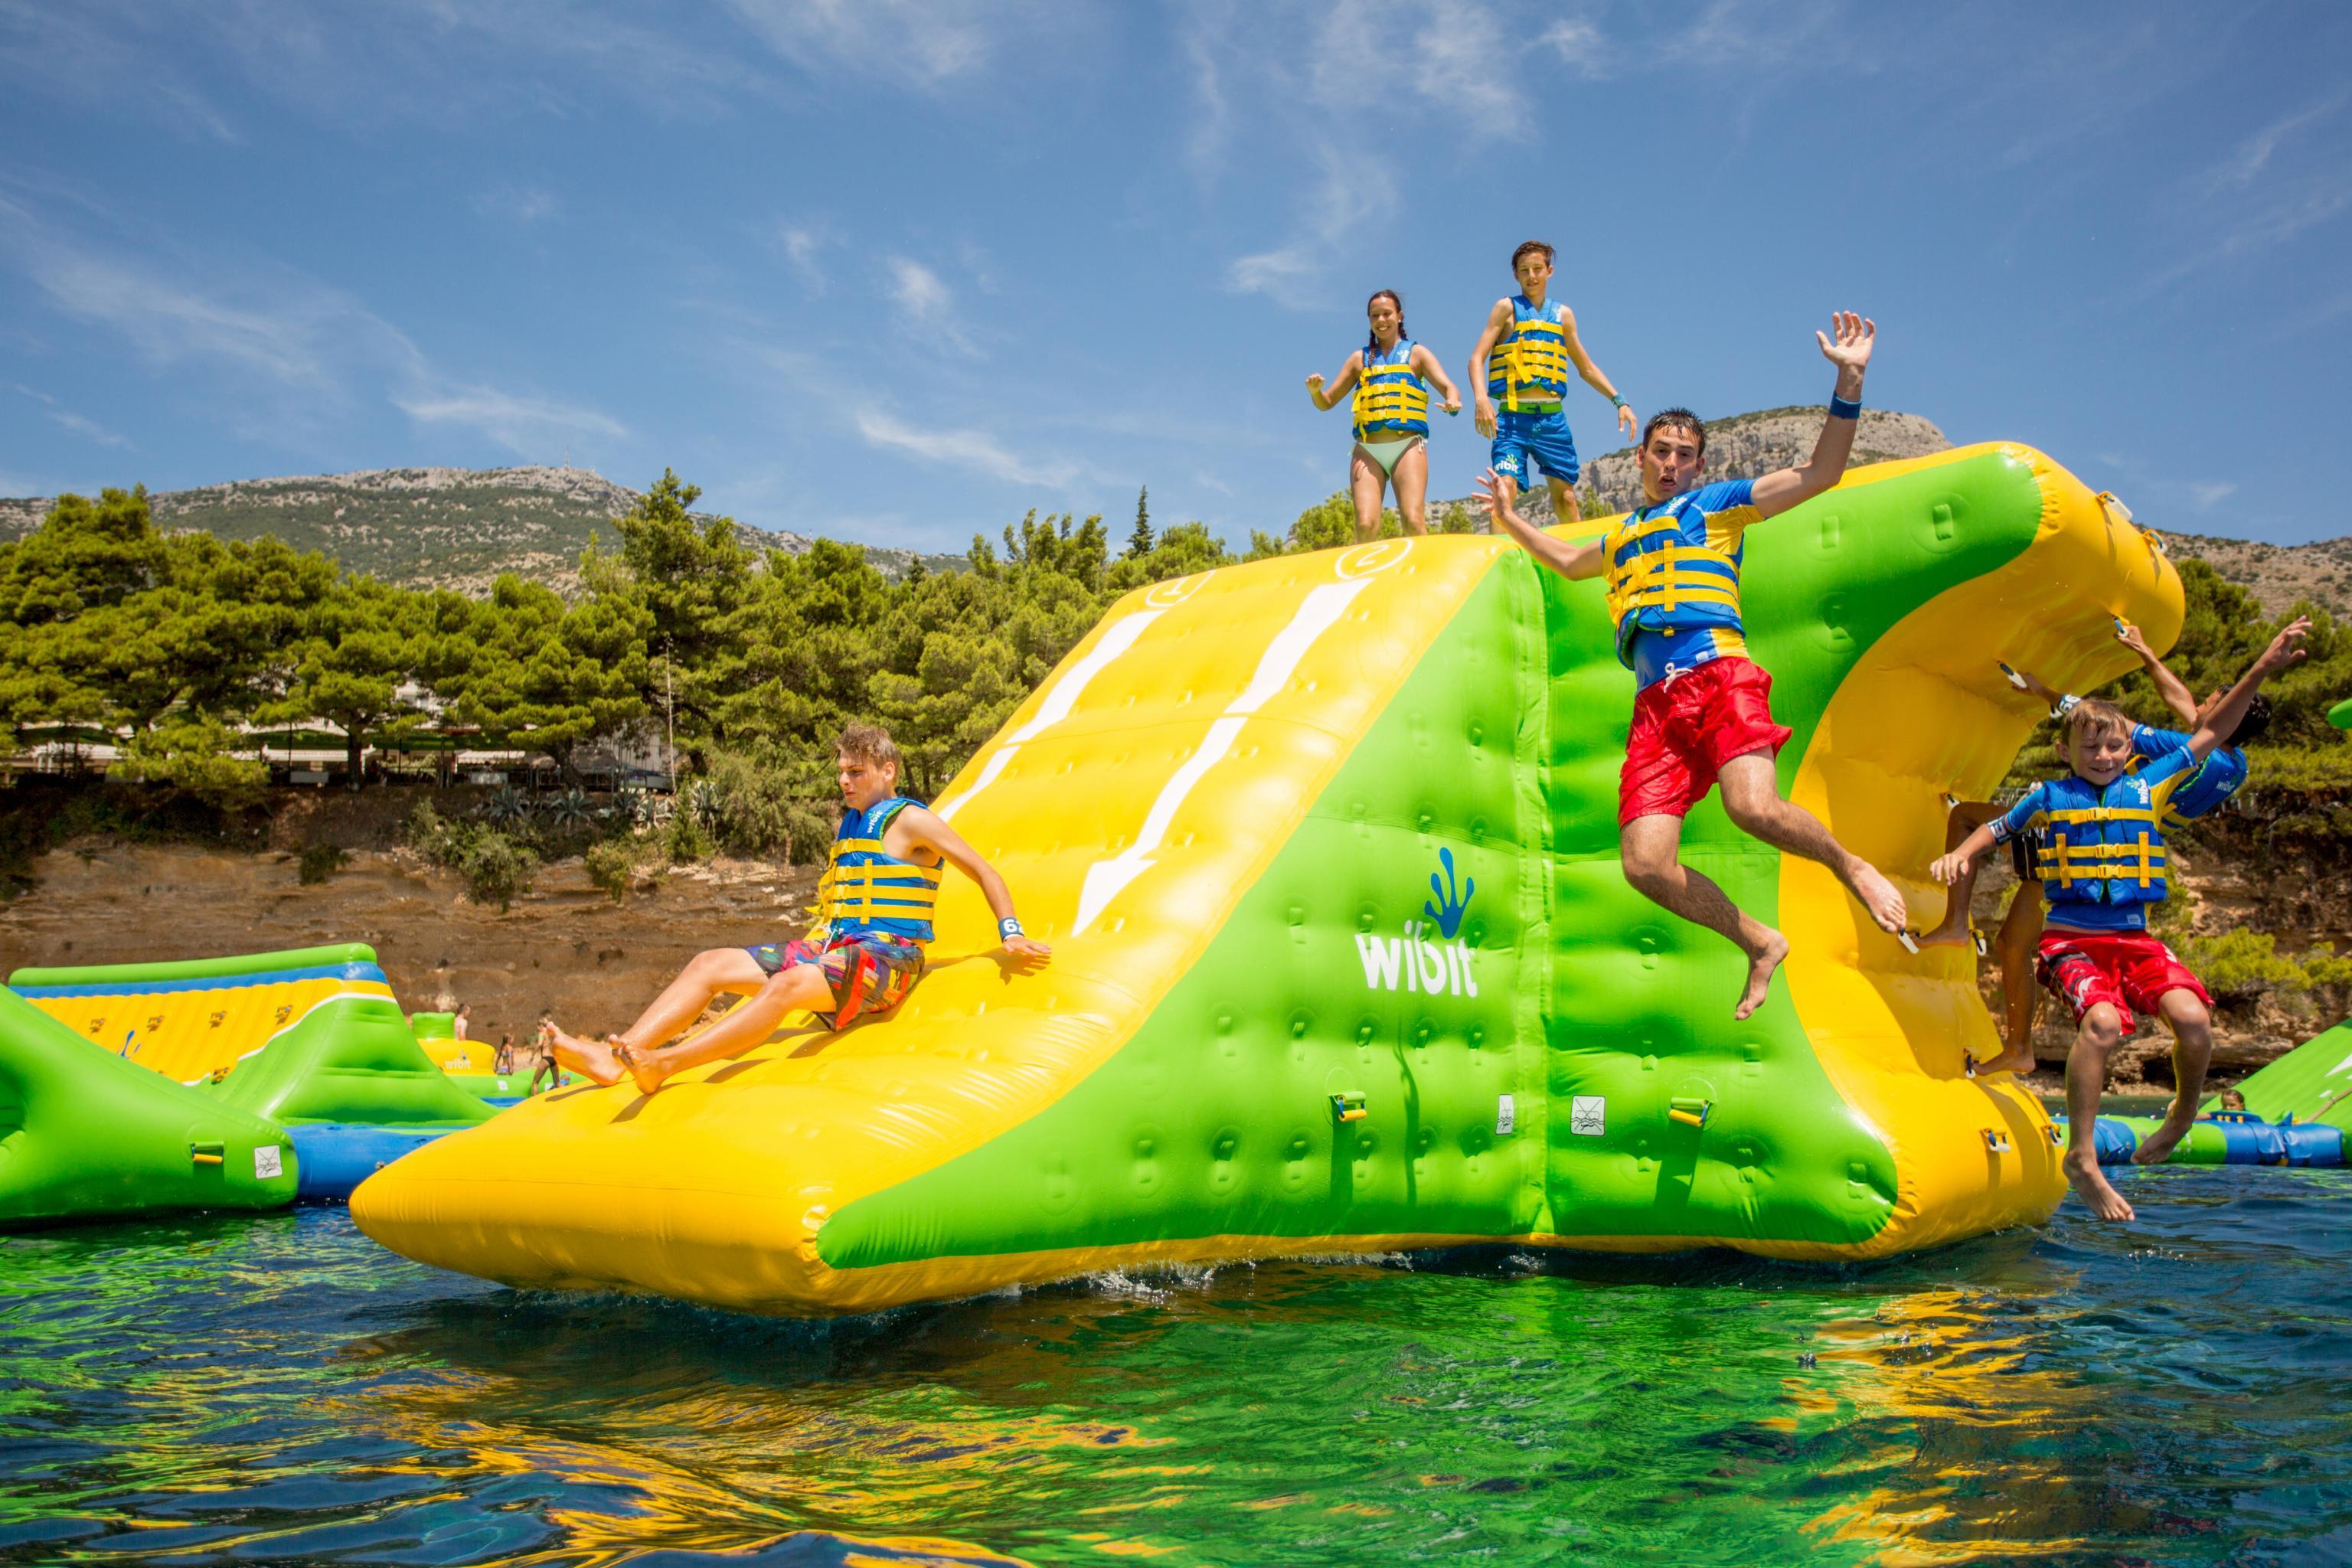 Playgrounds for big kids: A splashing good time at water park HydroDash at Sentosa